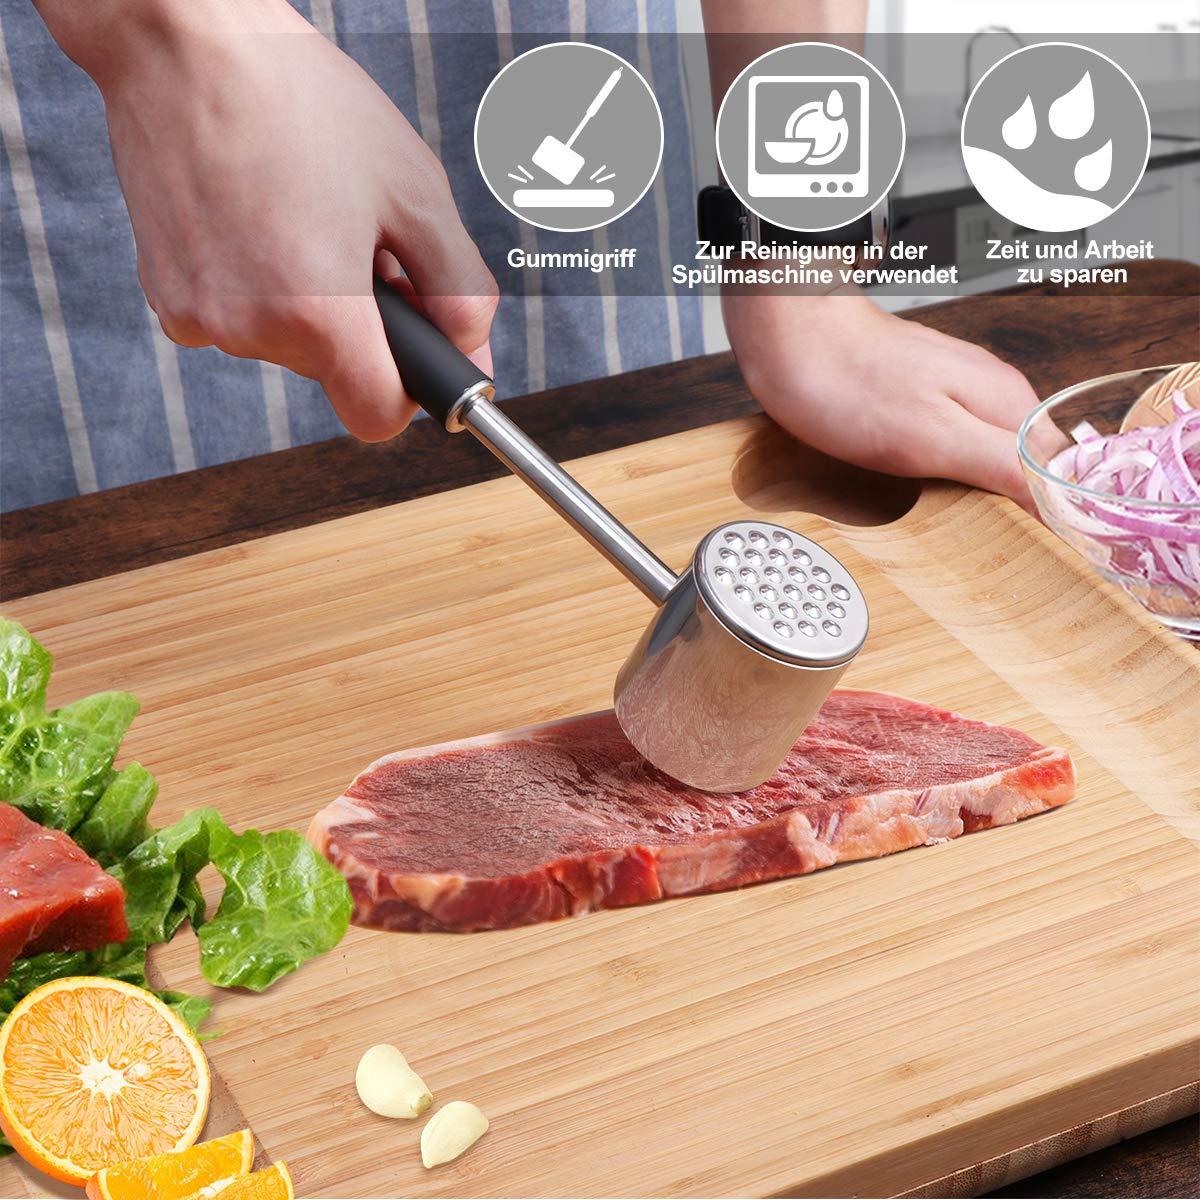 Homemaxs Fleischklopfer Doppelseitig Fleischklopfer-Tool 304 Edelstahl Sp/ülmaschinenfest